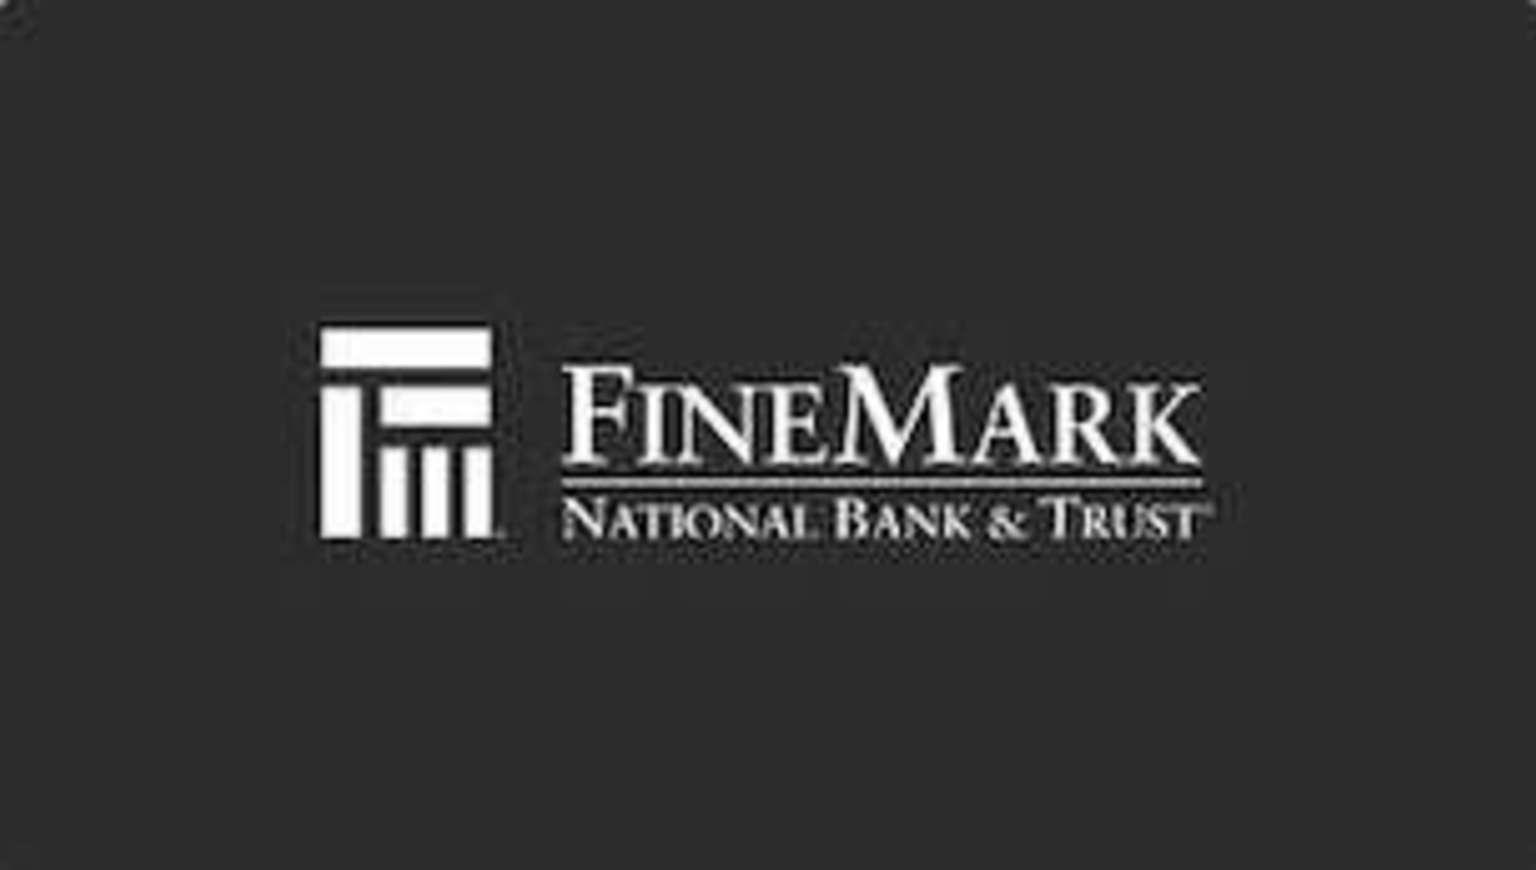 Read the Finemark customer story